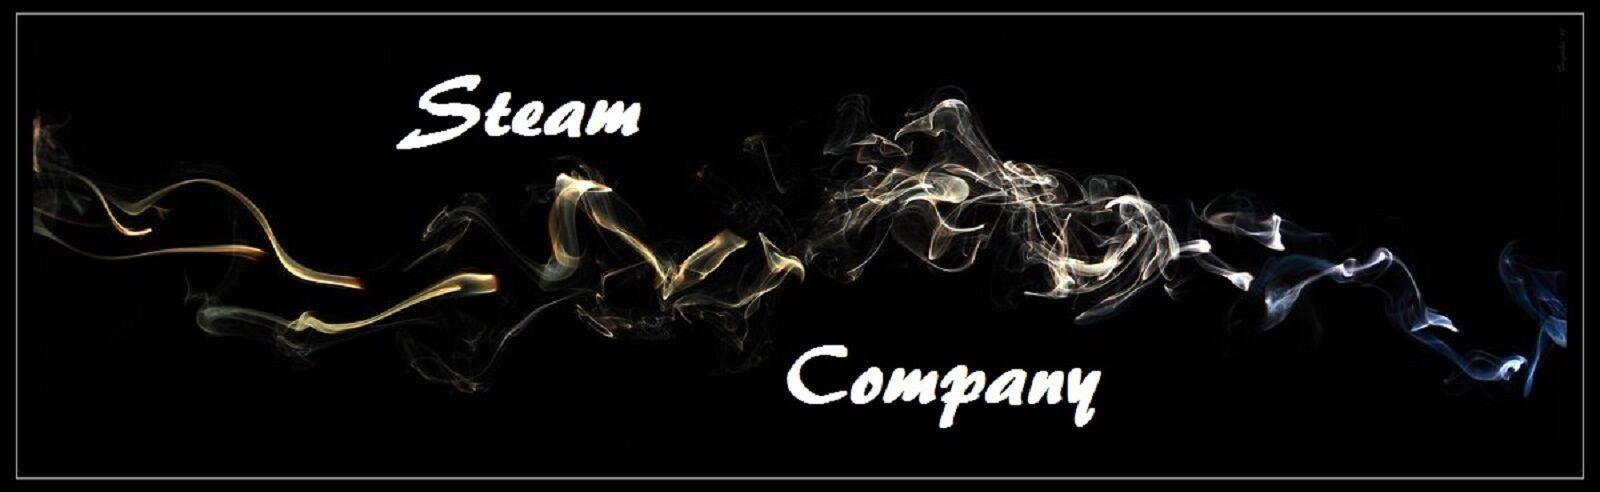 steam-company